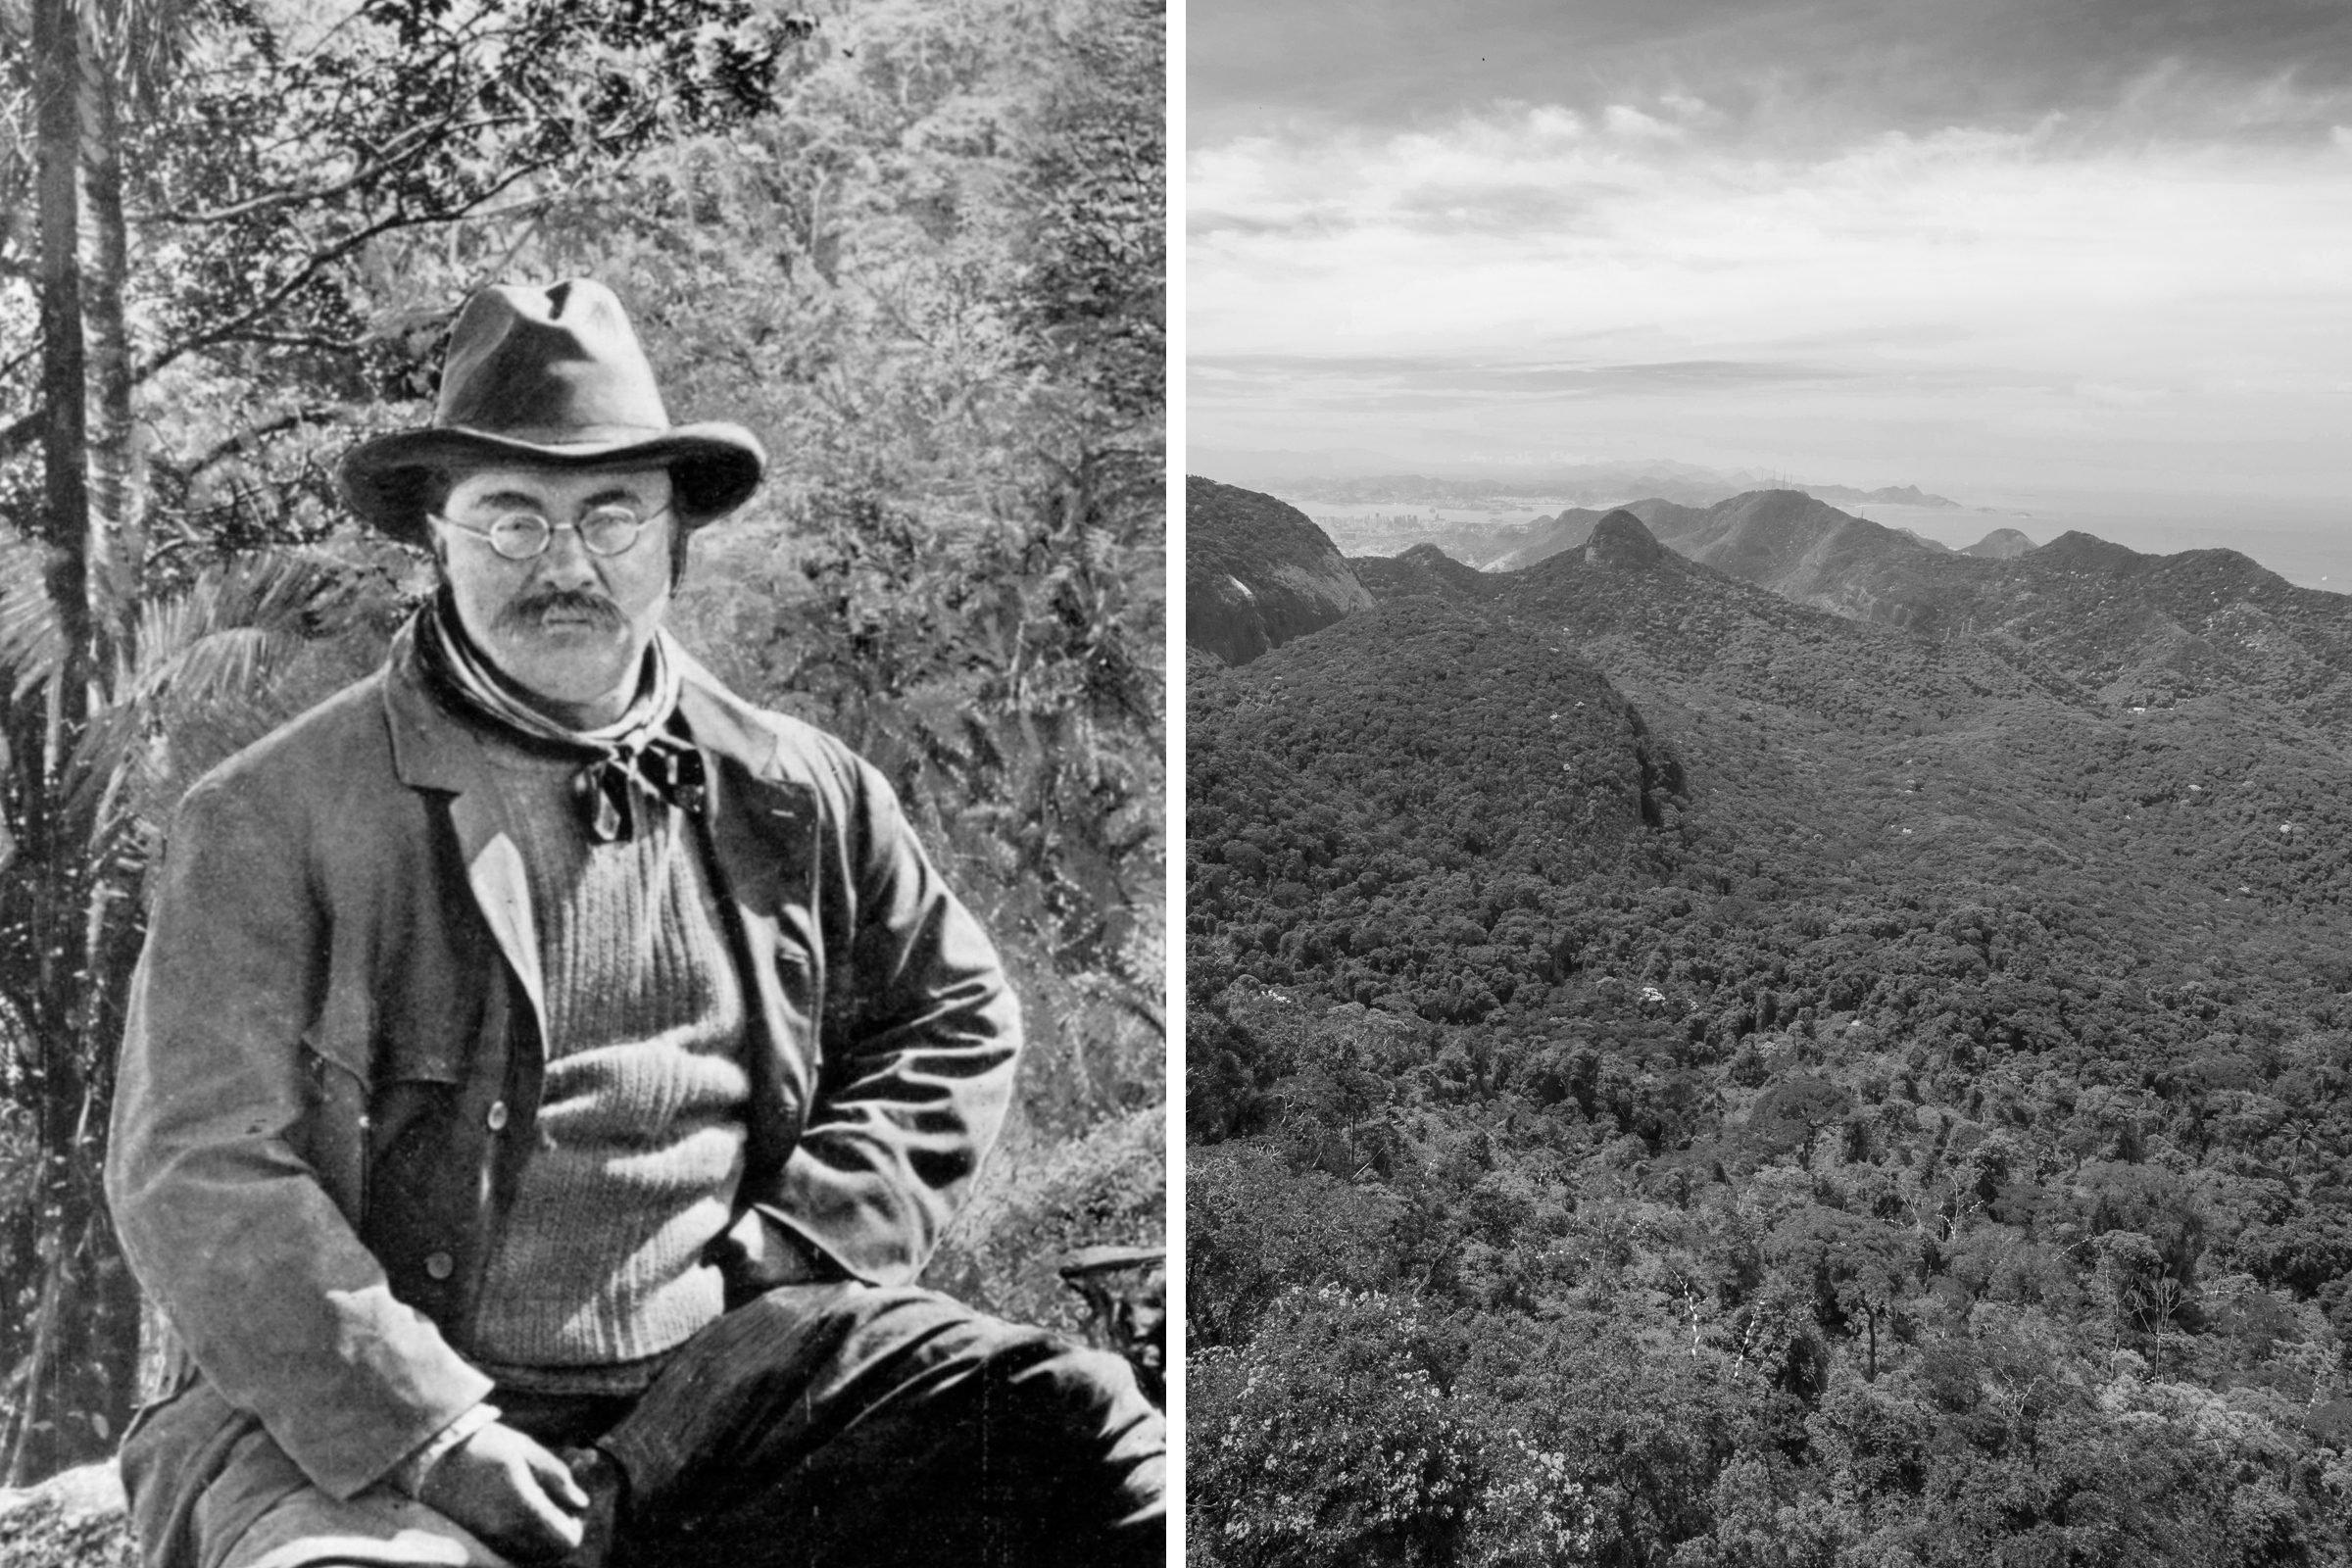 Theodore Roosevelt: Explorer